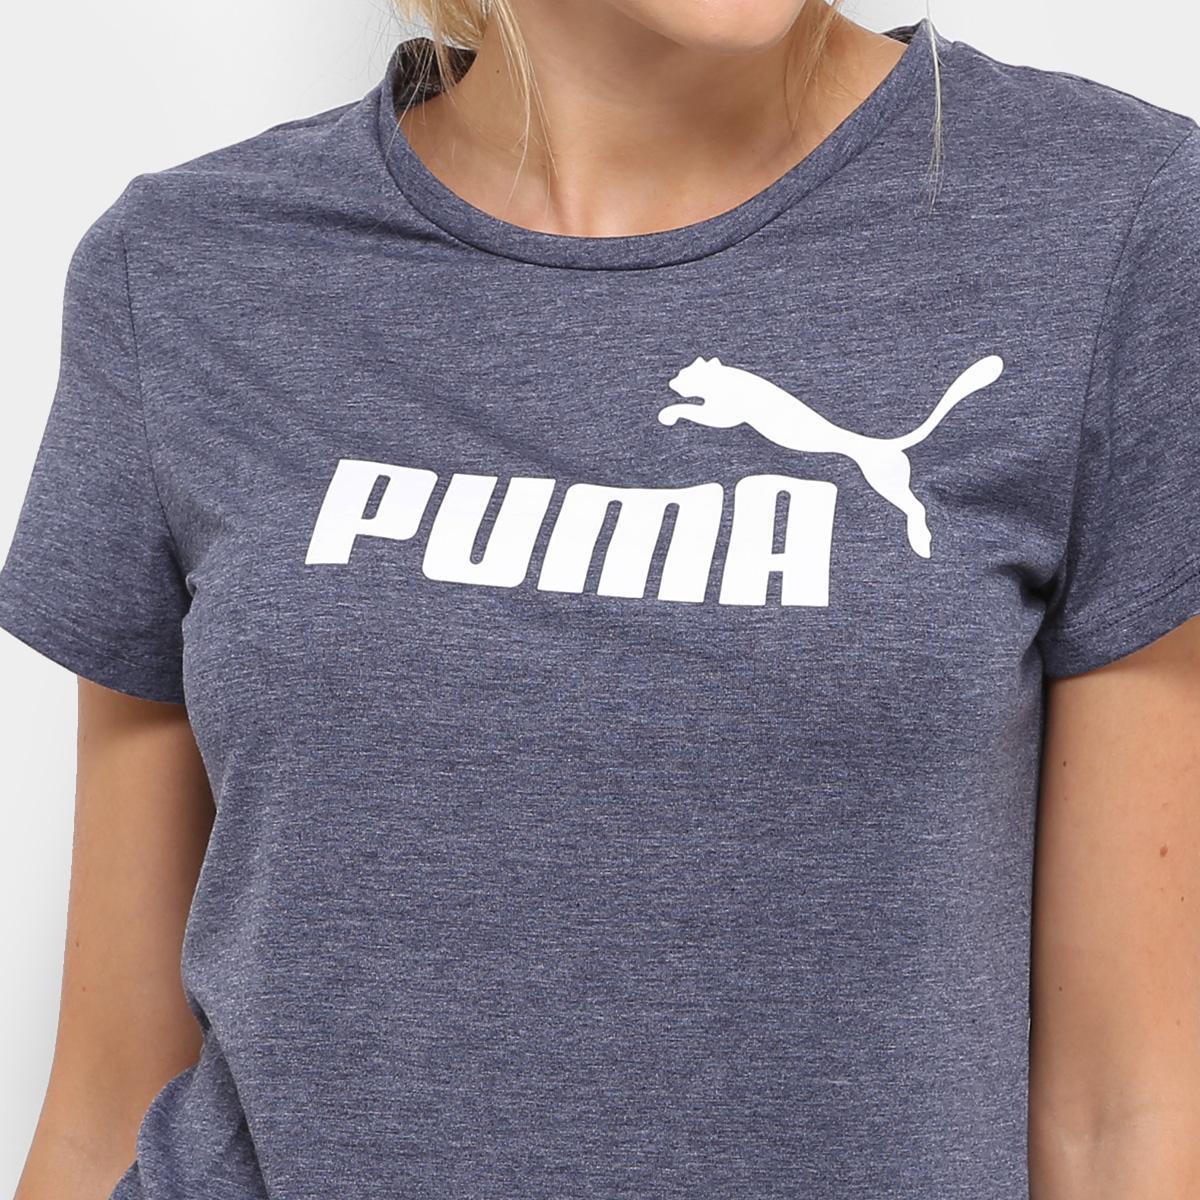 Camiseta Puma Essentials Heather Tee - Roxo - Original